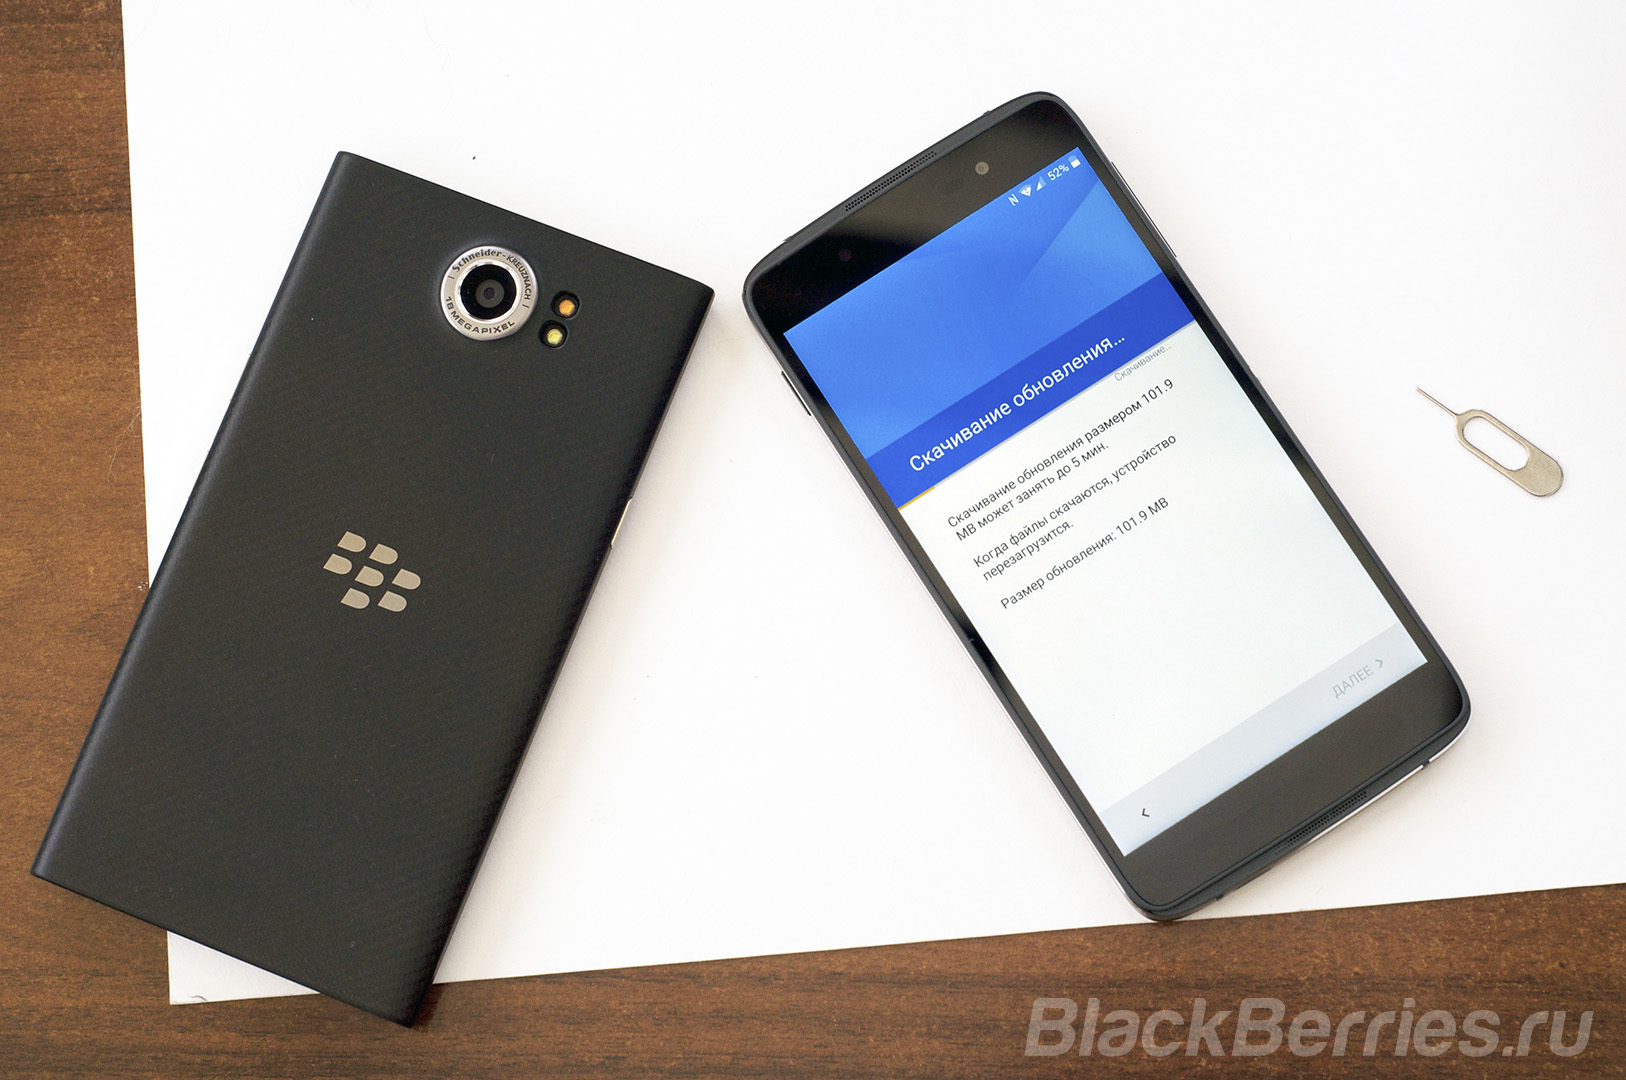 BlackBerry-DTEK50-review-36